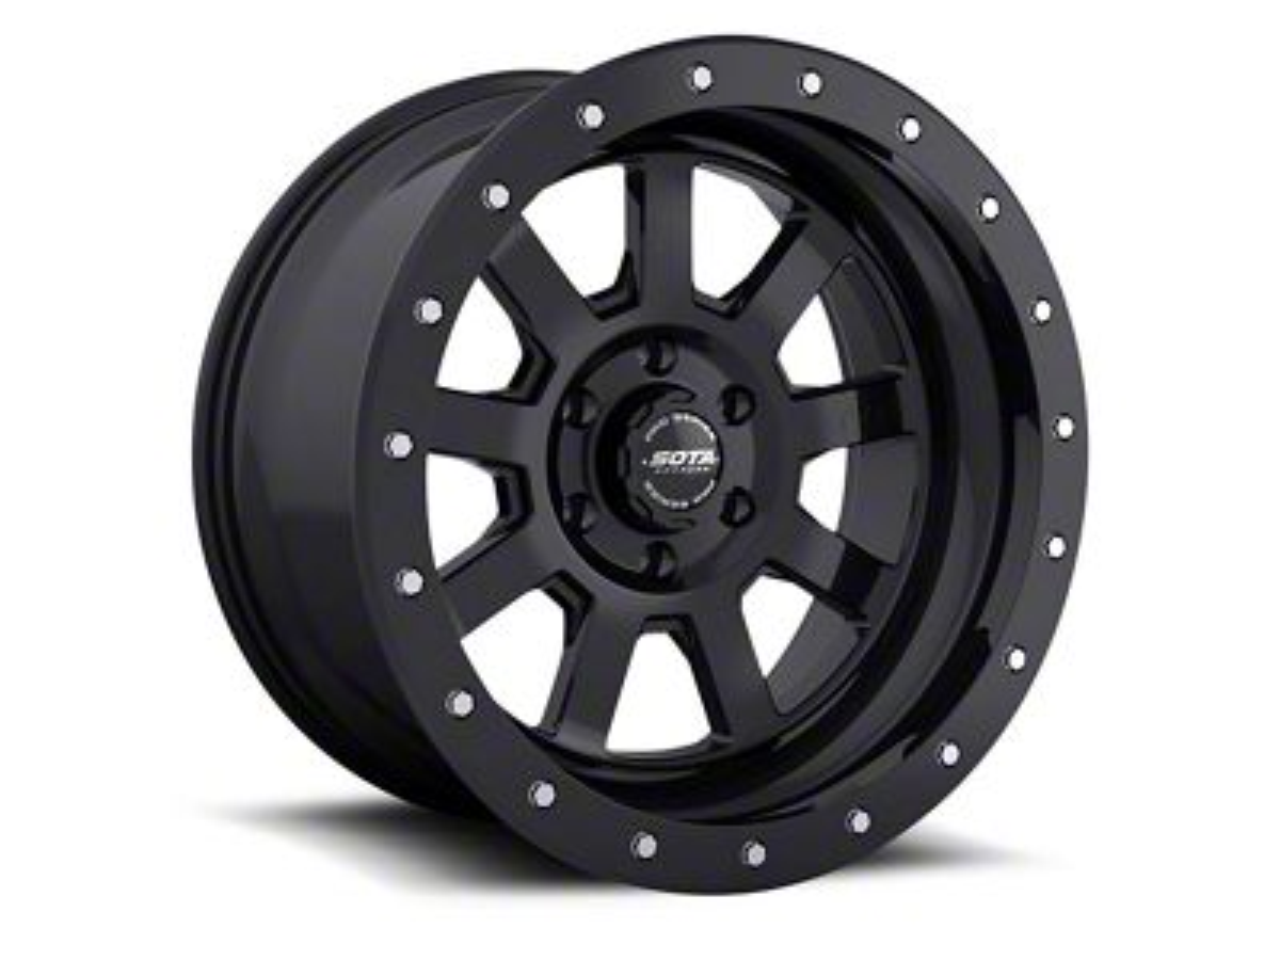 SOTA Off Road S.S.D. Stealth Black Wheel - 20x9 (07-18 Jeep Wrangler JK; 2018 Jeep Wrangler JL)